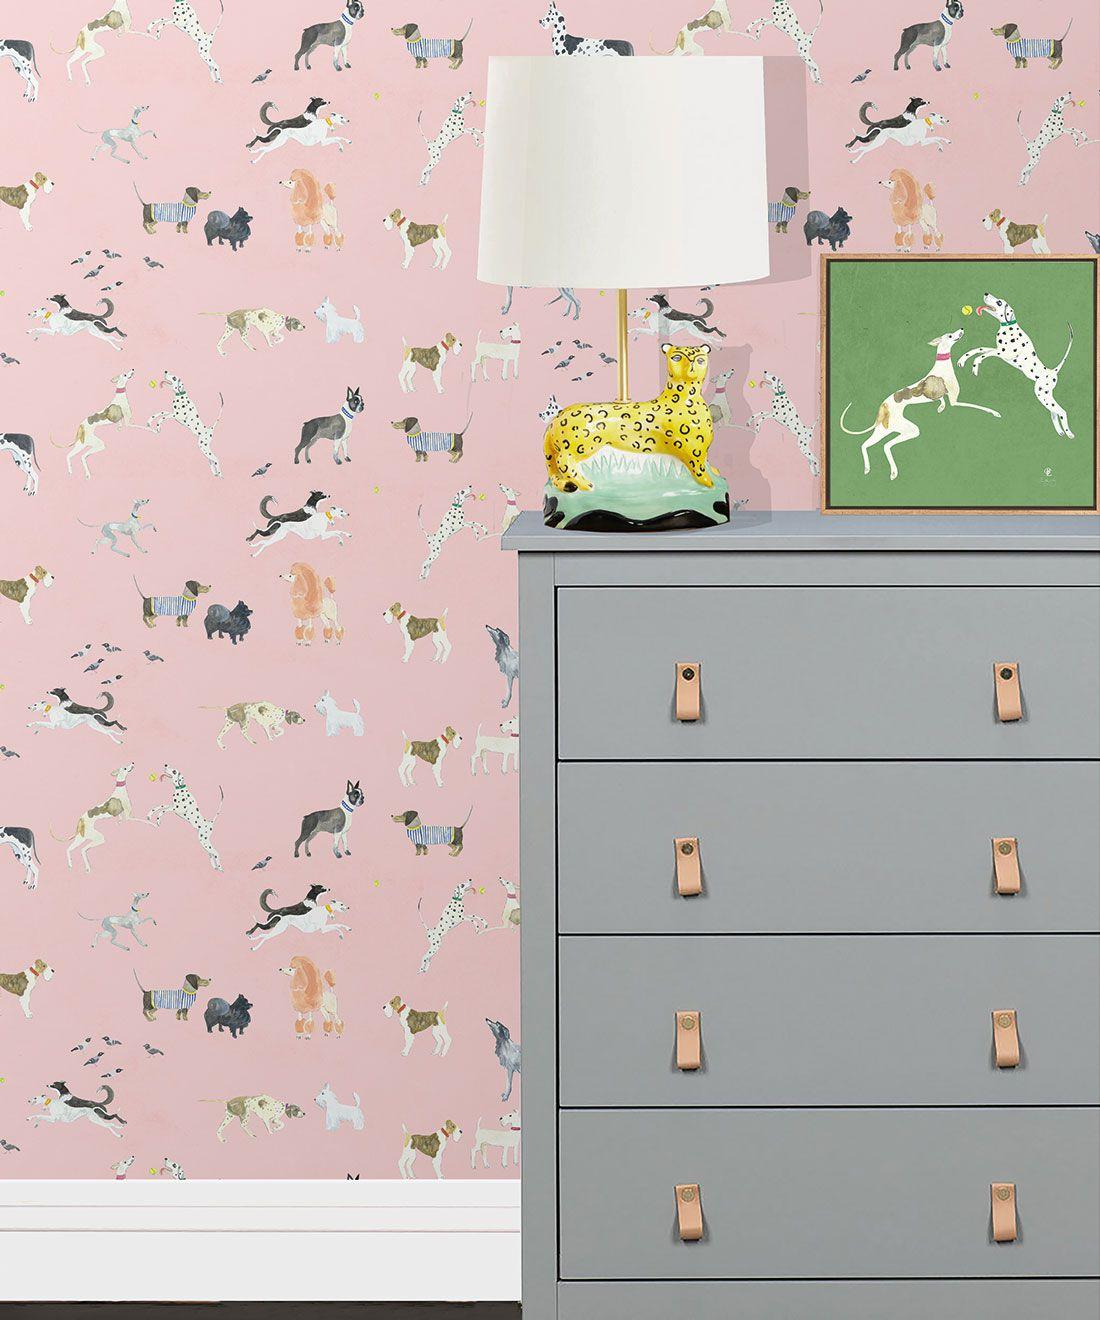 Doggies Wallpaper •Dog Wallpaper •Pink • Insitu with lamp on dresser